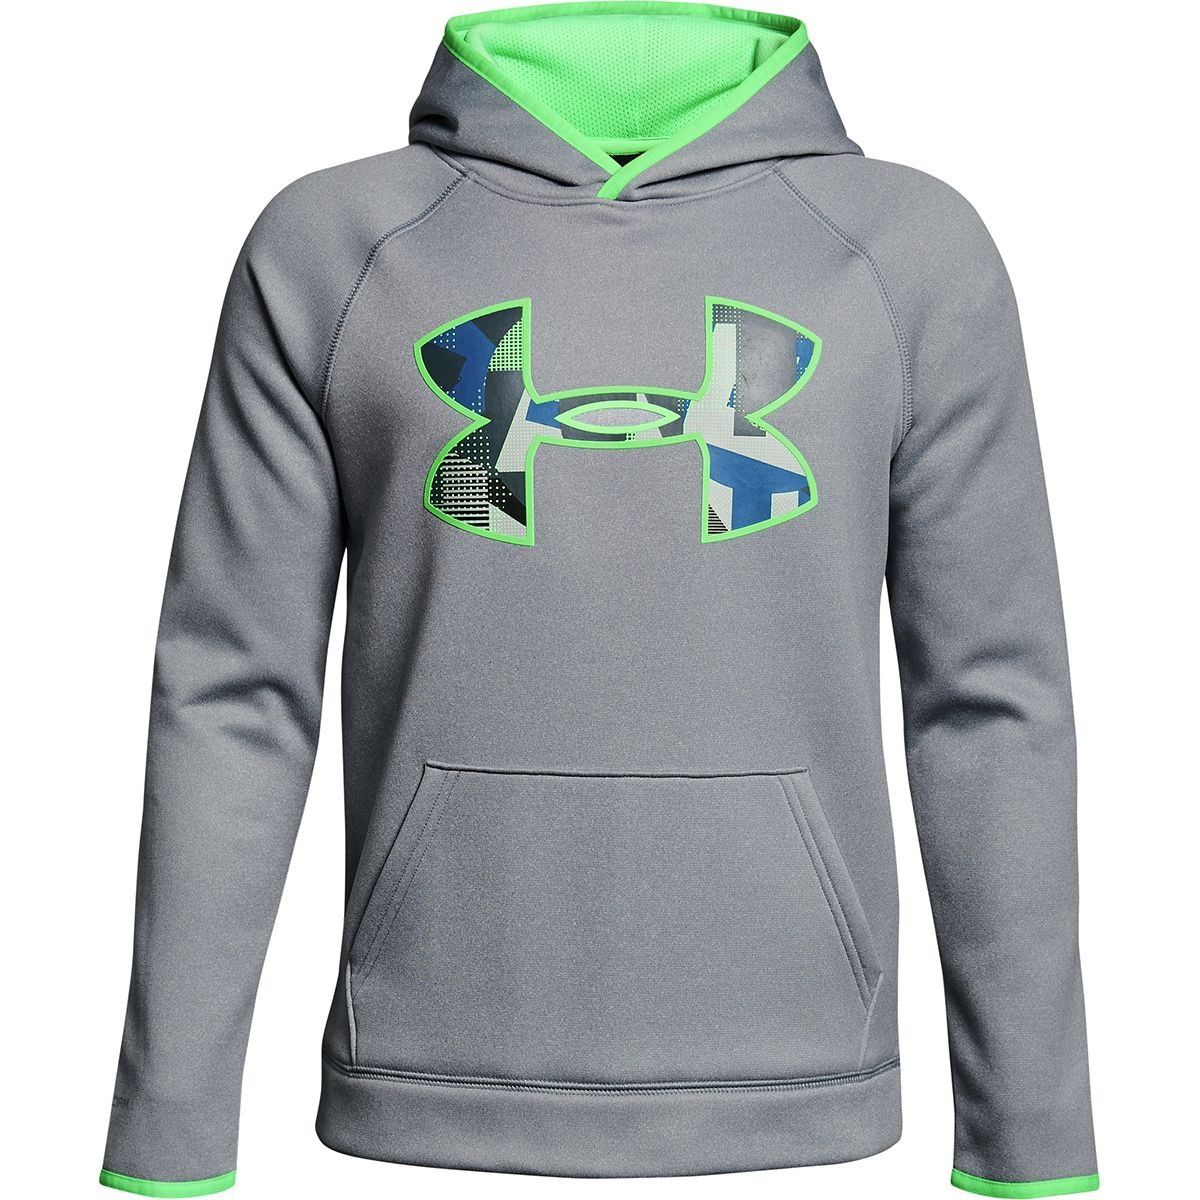 Under Armour Kids Boy's Armour Fleece Big Logo Hoodie (Big Kids) Steel Light Heather/Arena Green/Arena Green X-Small